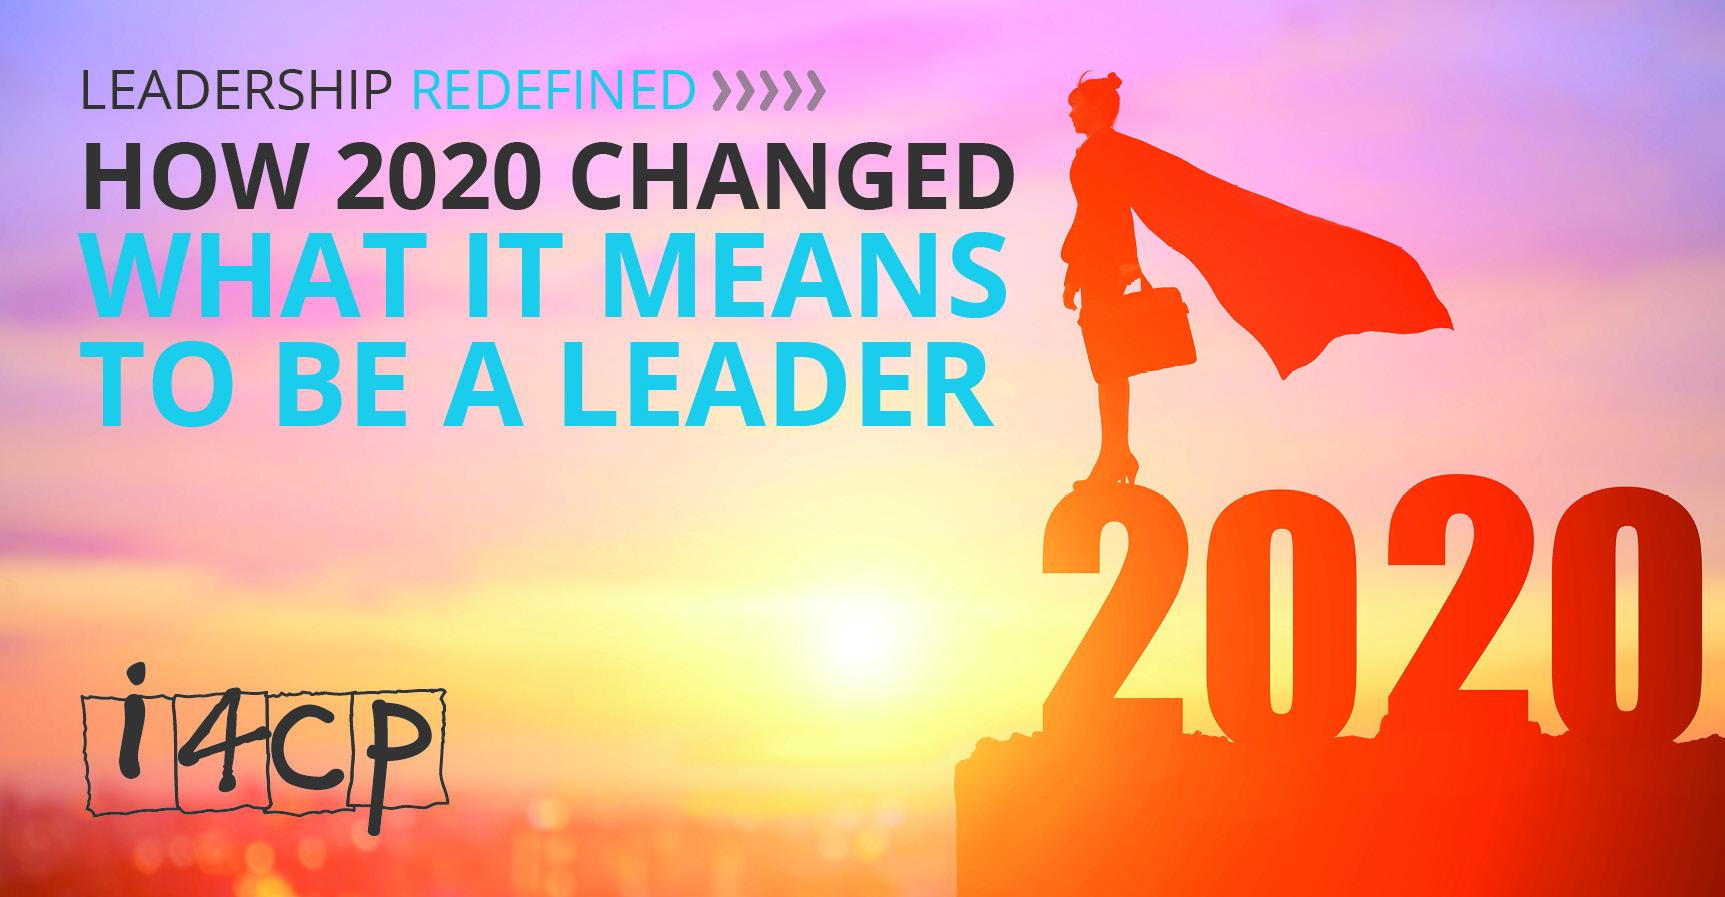 2020 Changed Leadership Behaviors hero image